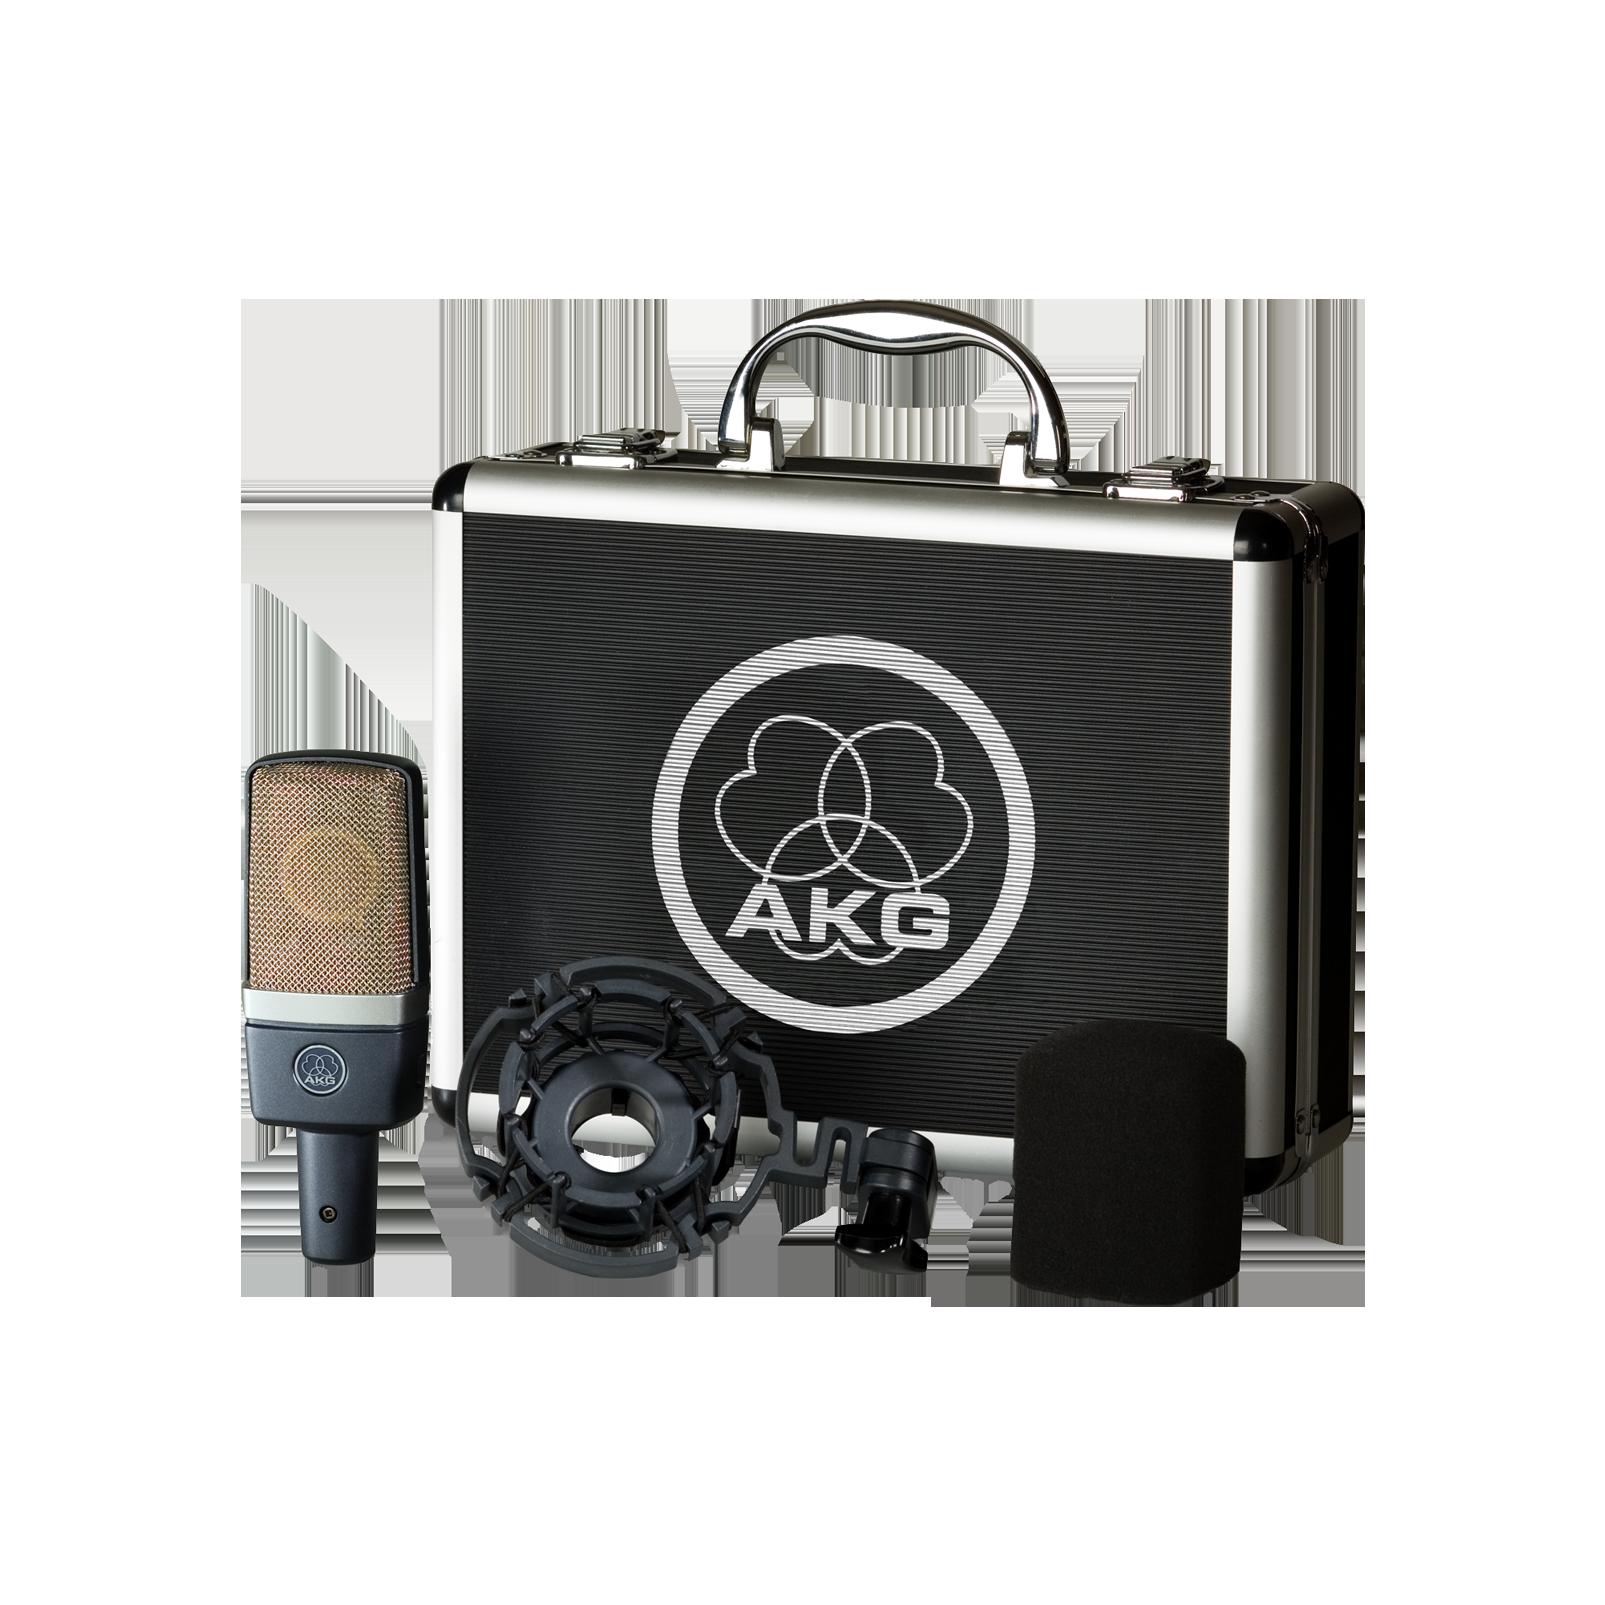 C214 - Black - Professional  large-diaphragm  condenser microphone - Detailshot 3